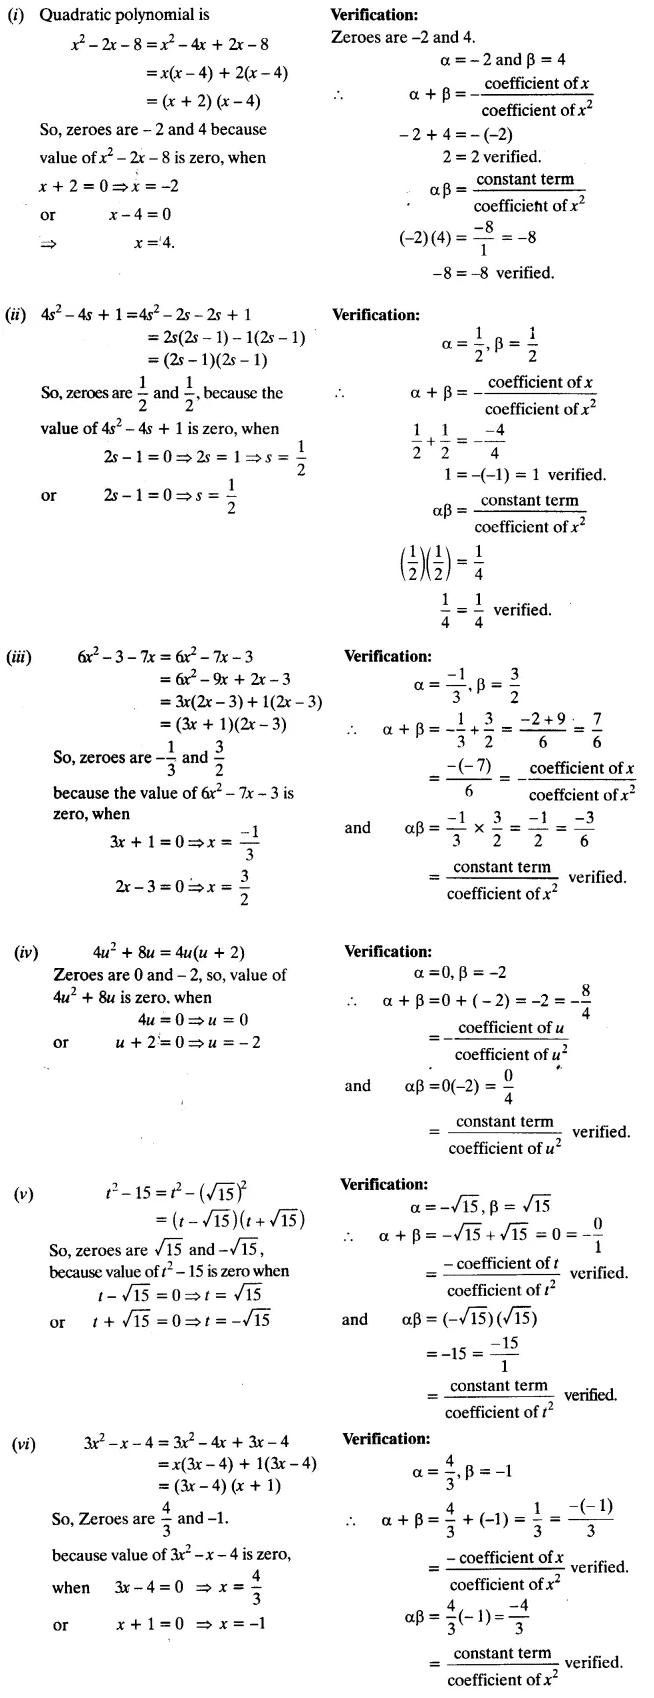 Class 10 Maths Ncert Solutions Chapter 2 Polynomials Learn Cbse Https Www Learncbse In Class 10 Maths Ncert So Maths Ncert Solutions Polynomials Quadratics [ 1698 x 654 Pixel ]